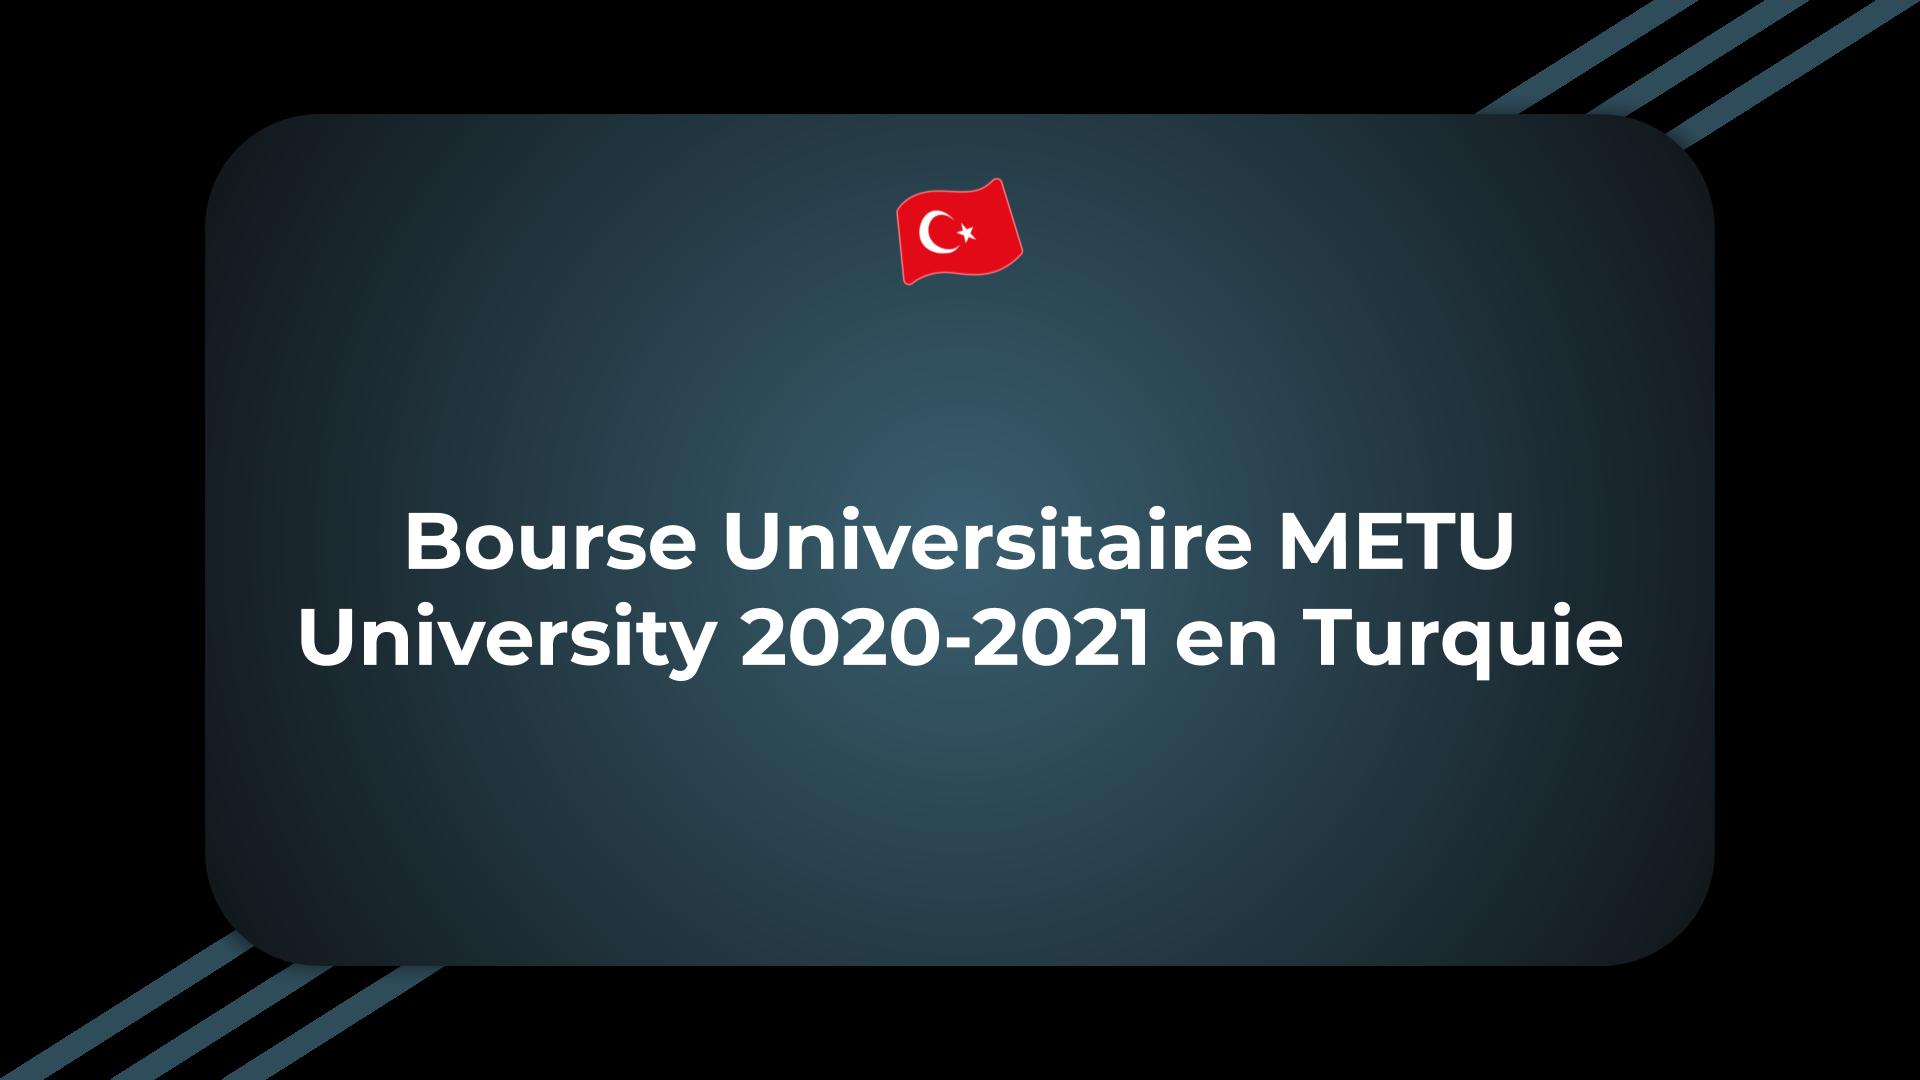 Bourse Universitaire METU University